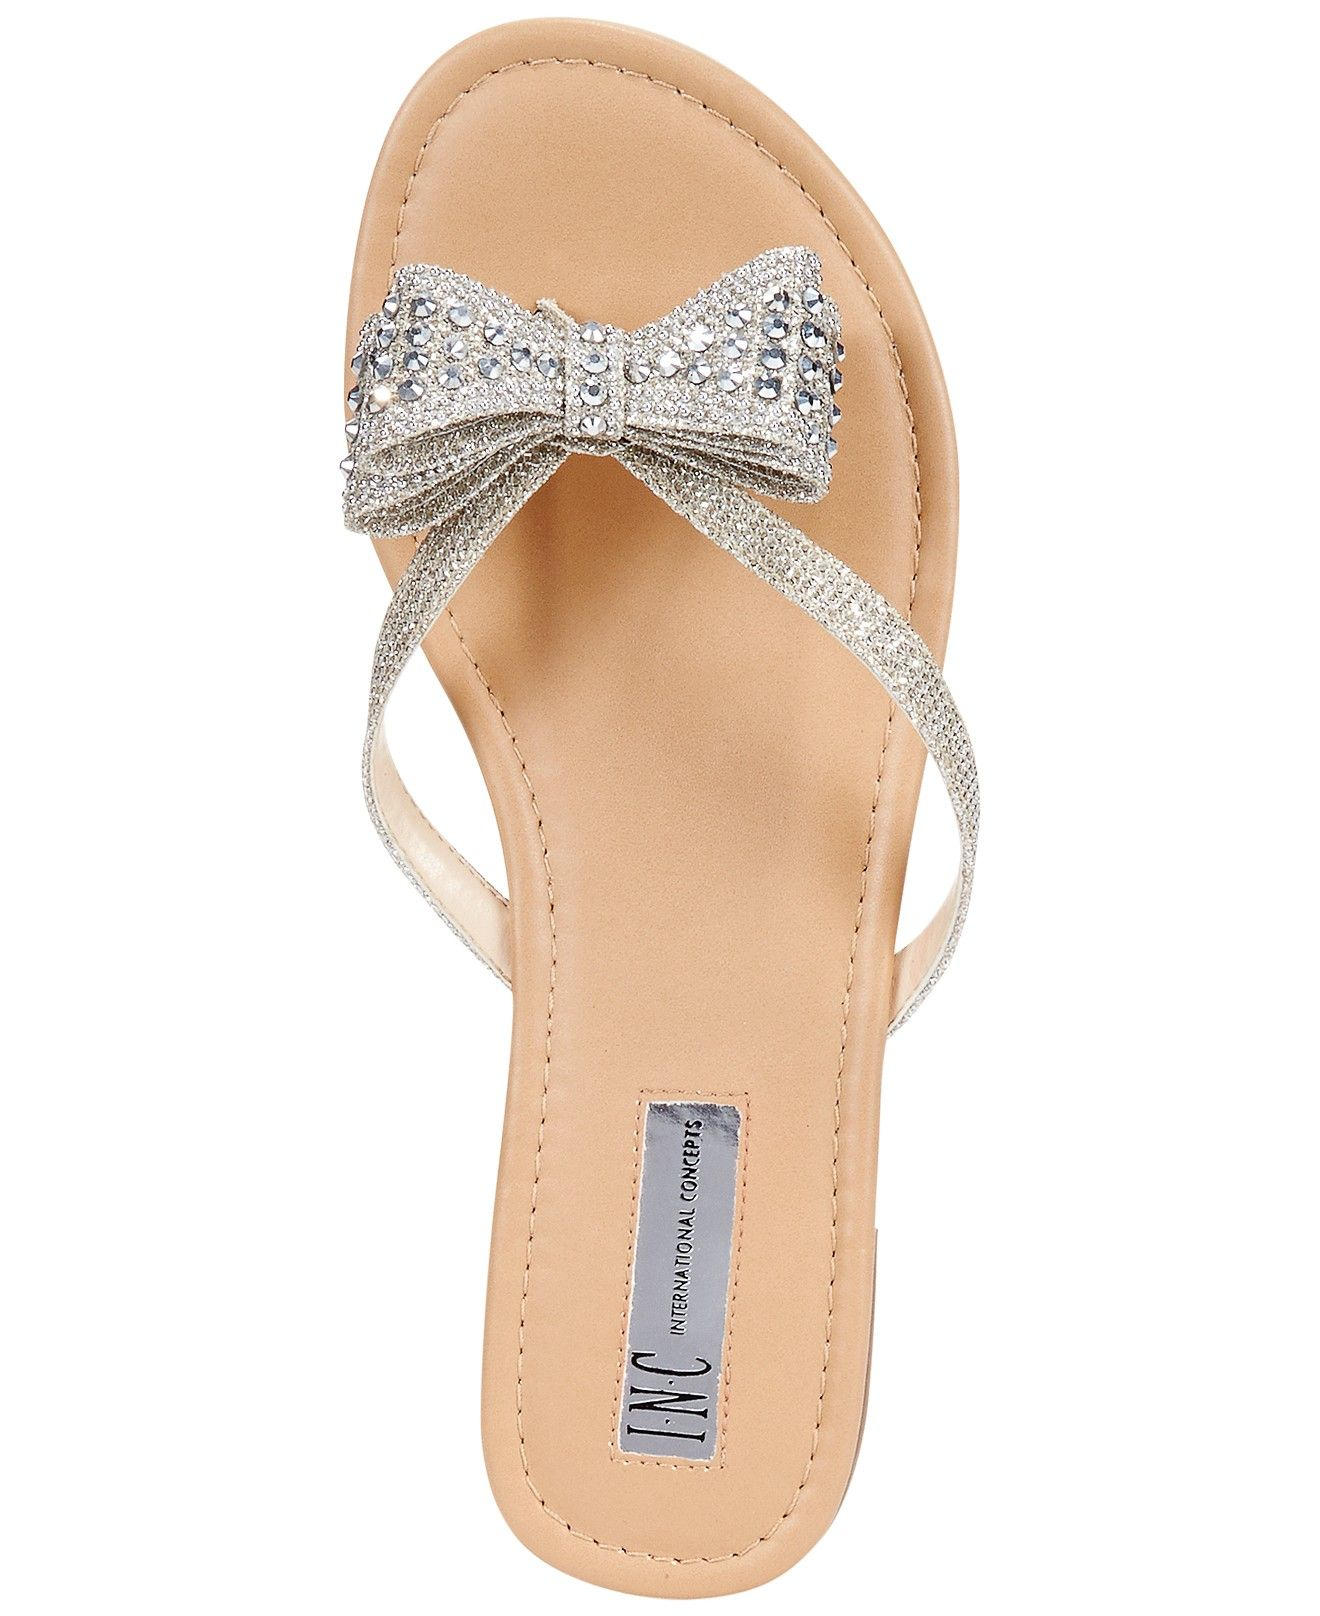 a140b19bbeae85 INC International Concepts Women s Malissa Bow Thong Sandals - Shoes -  Macy s